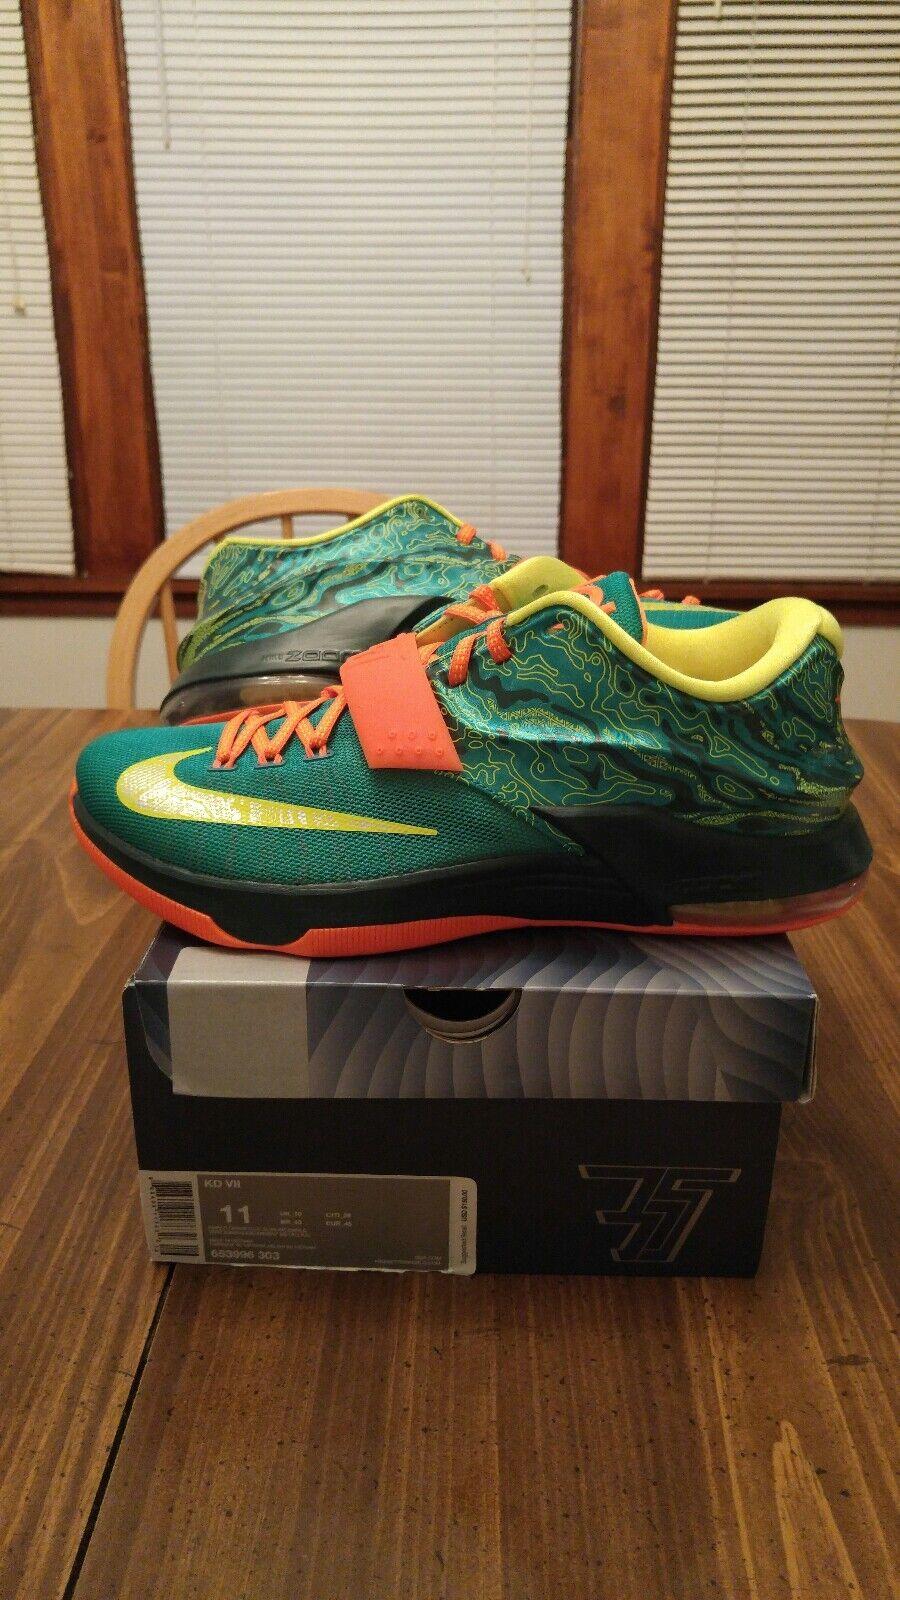 Nike Size KD VII Men's basketball Size Nike 11 Emrld grn/ mtllc silver 653996303 237c0a